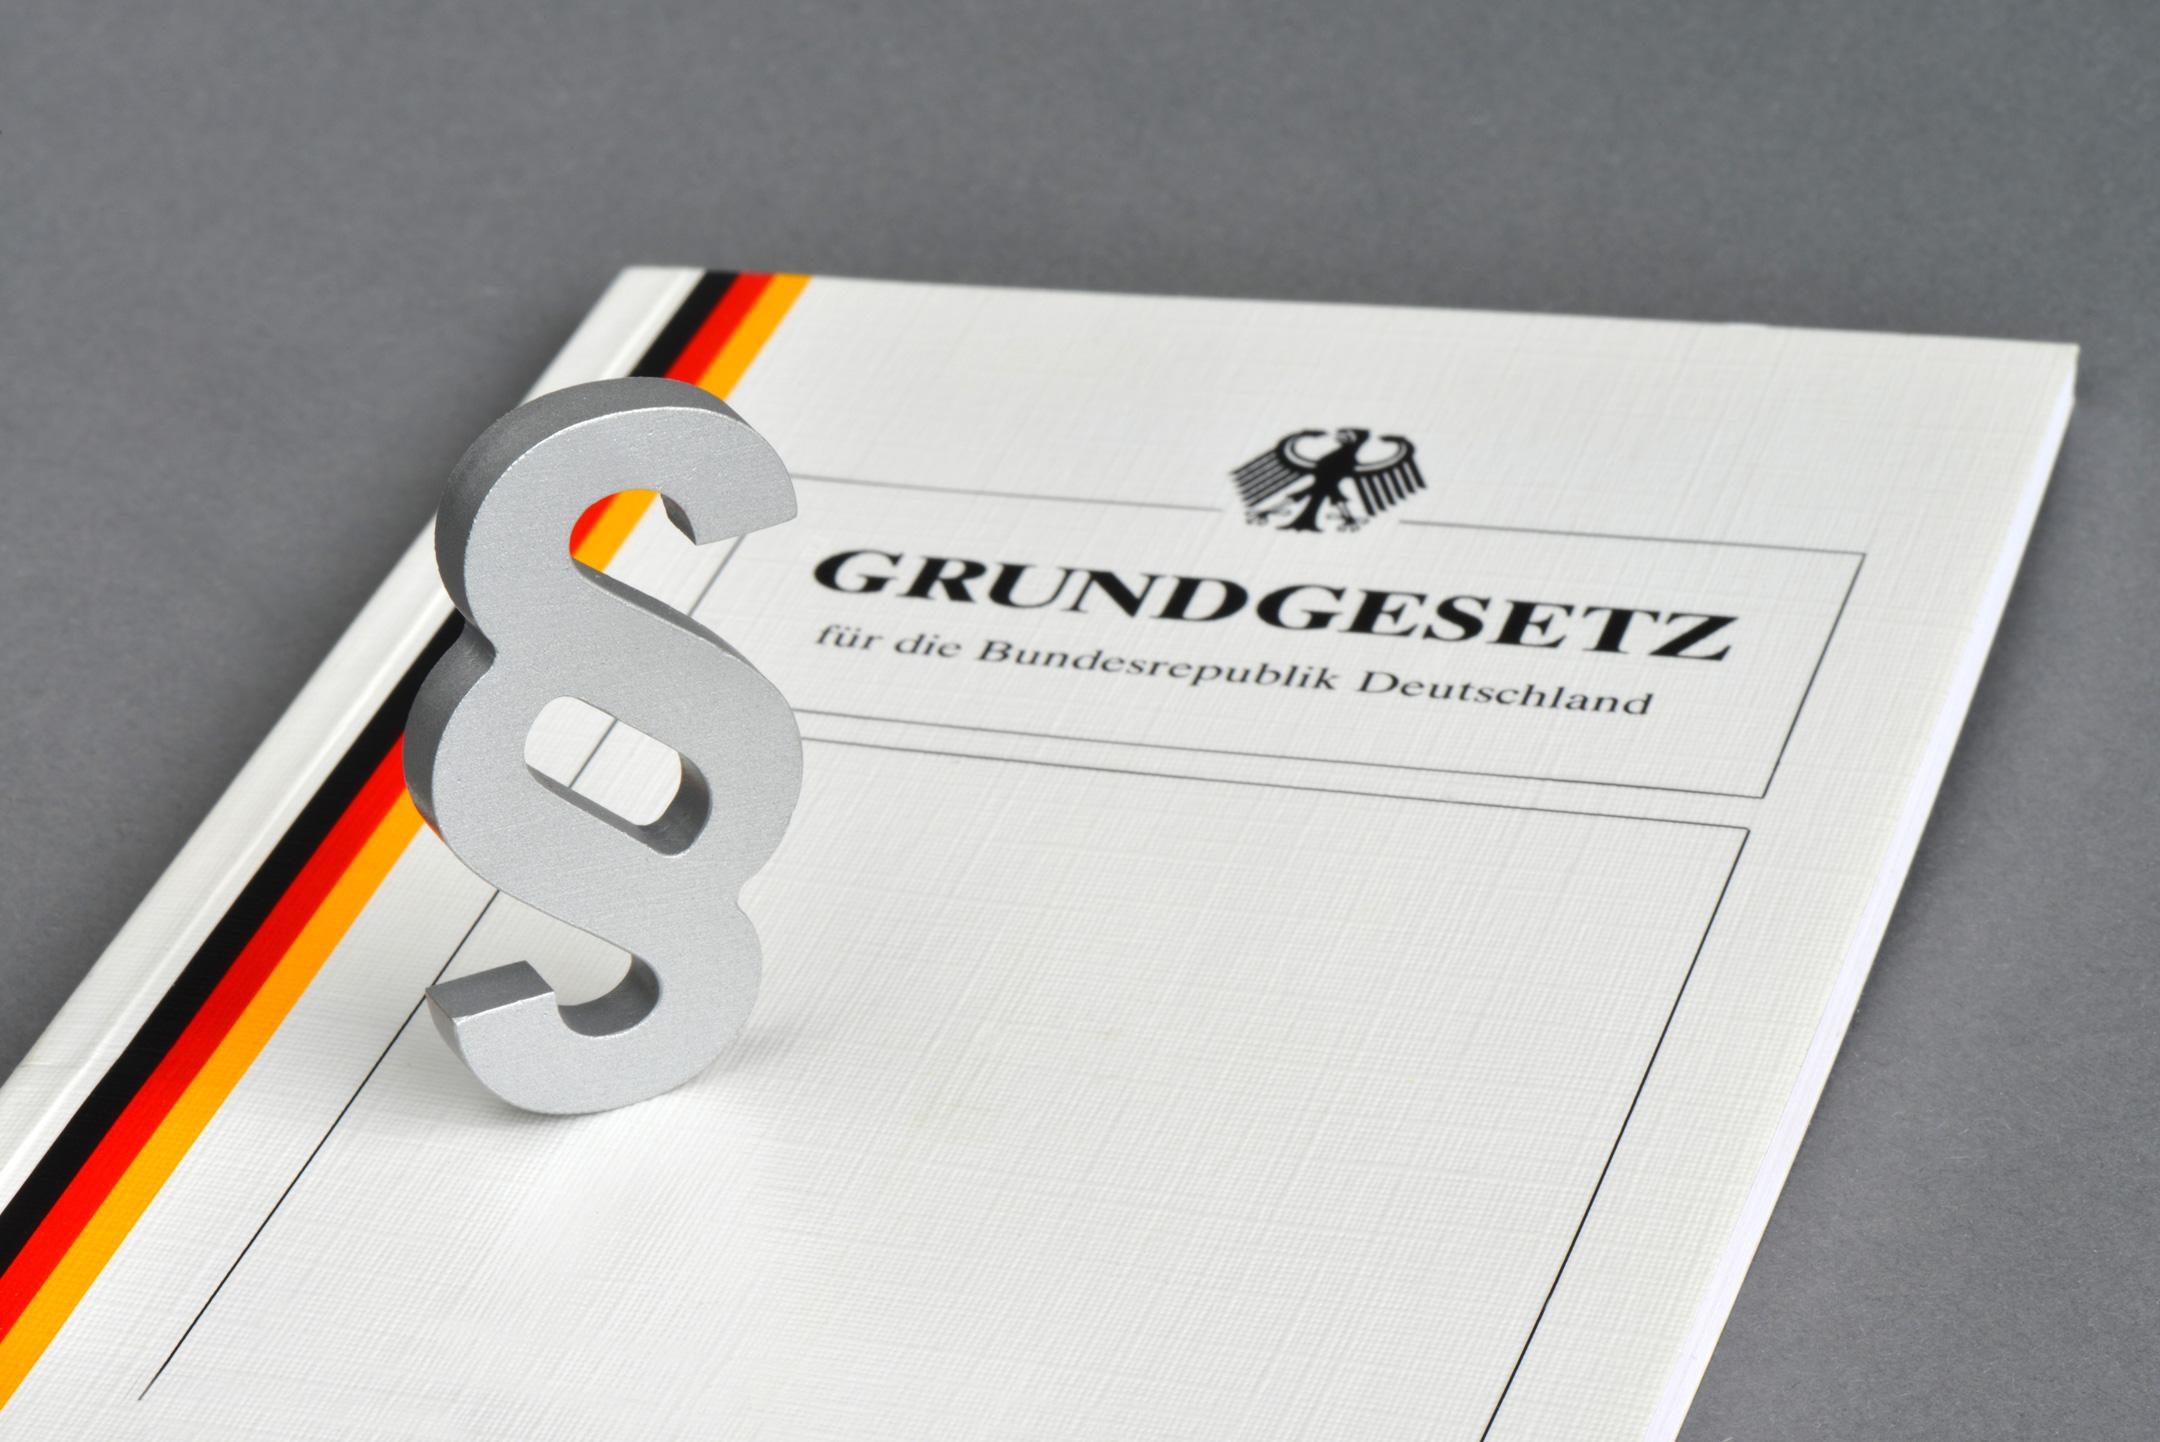 shutterstock Grundgesetz web